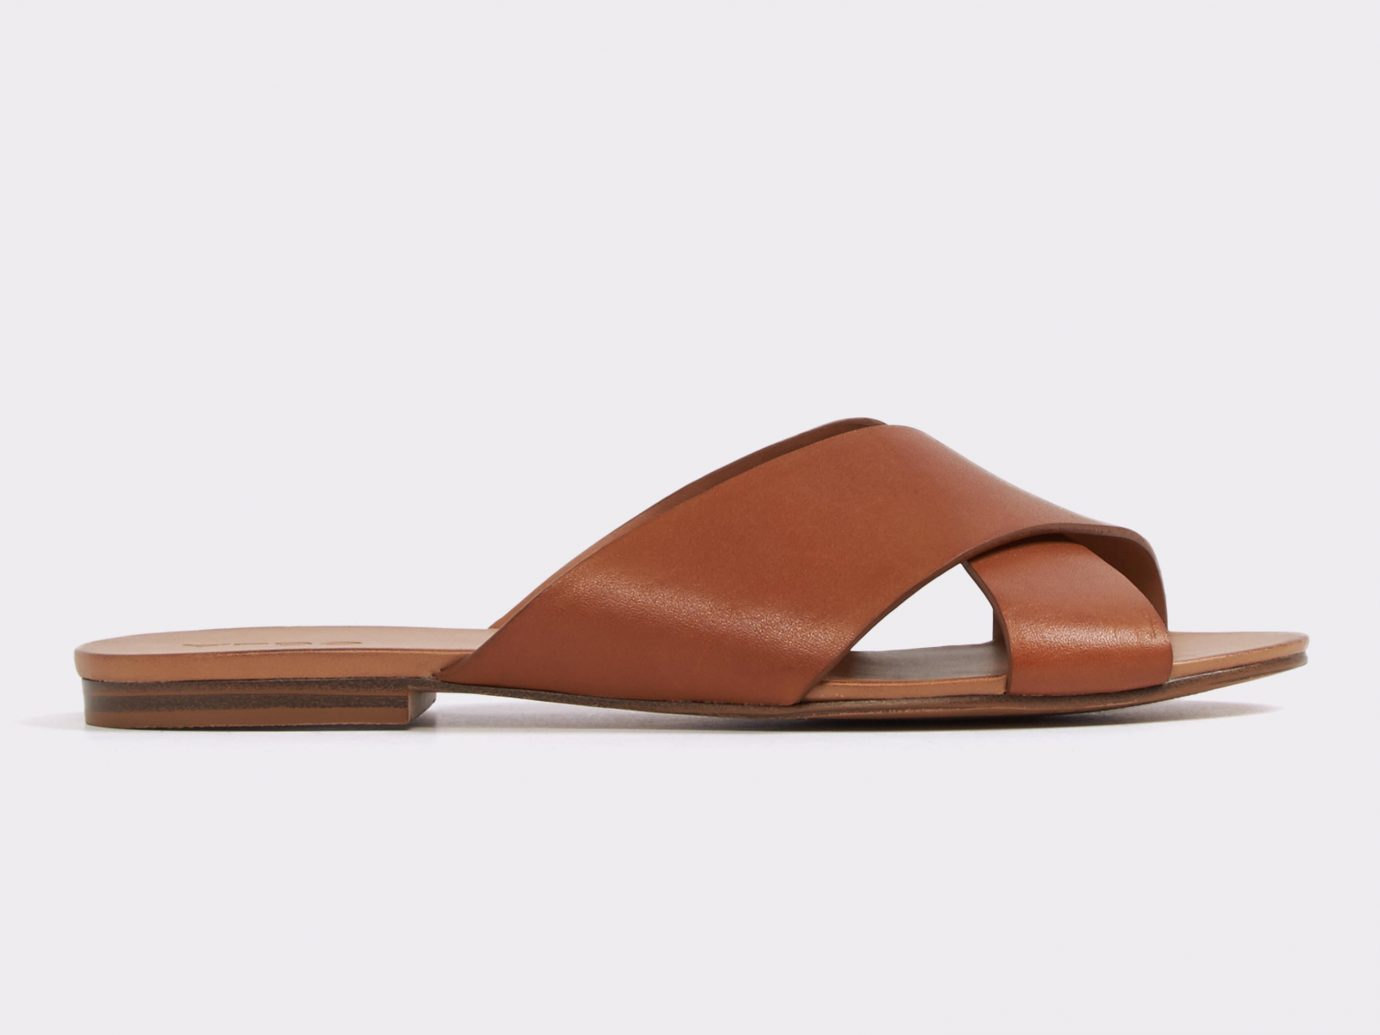 Style + Design footwear brown tan shoe sandal product design outdoor shoe slide sandal product leather accessory